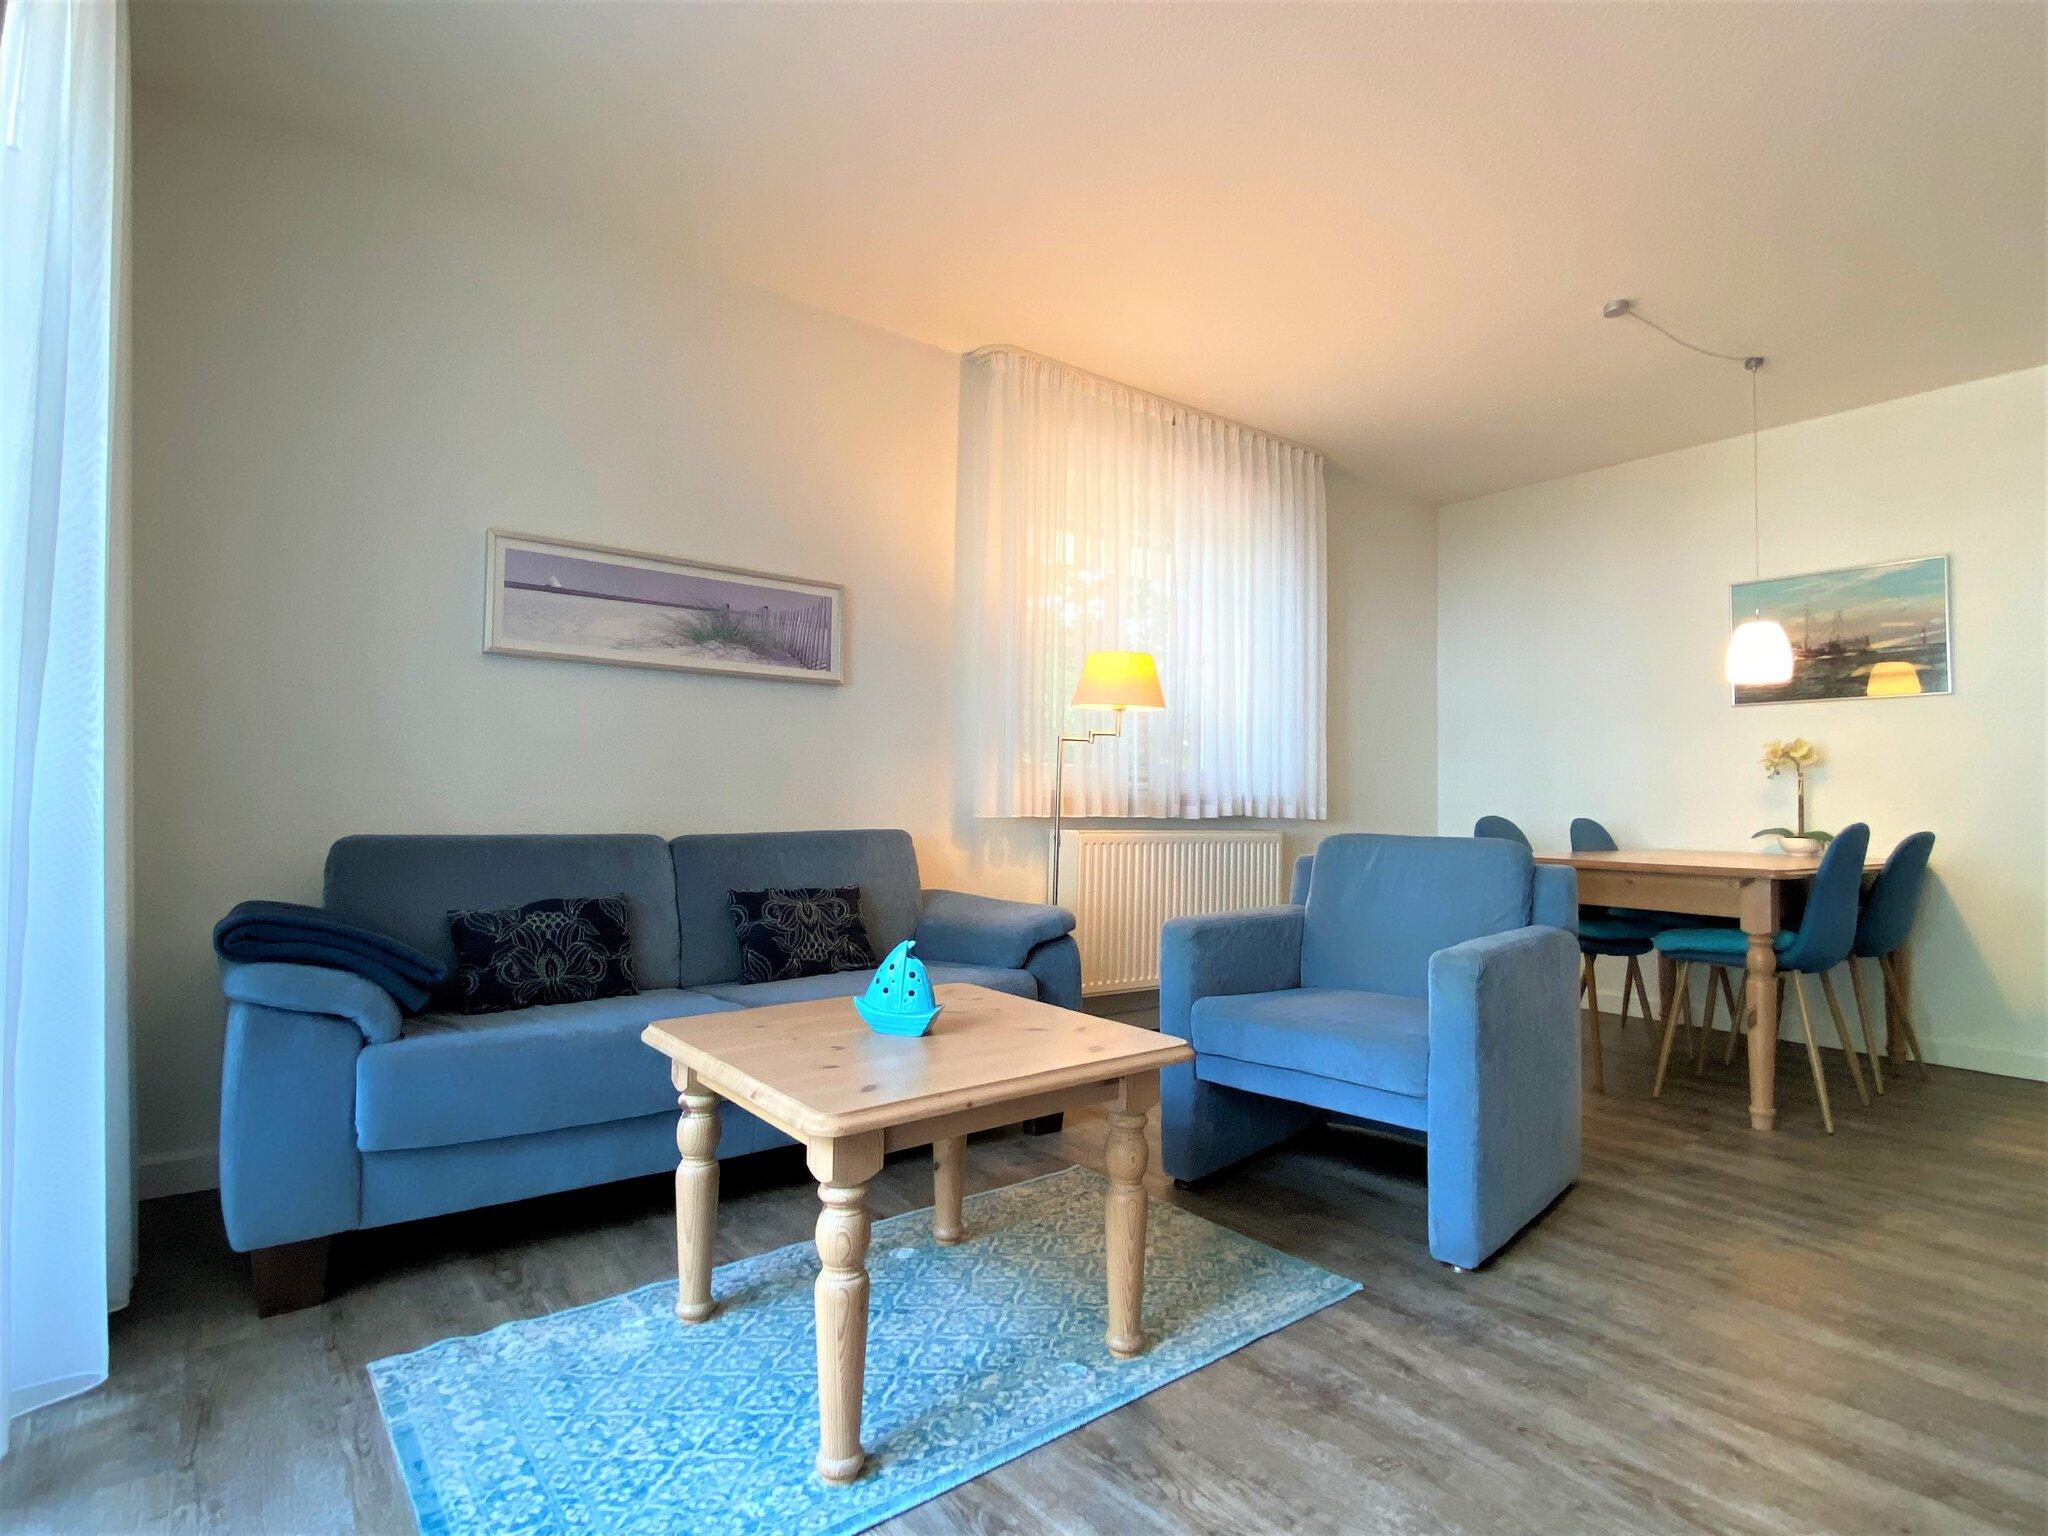 Apartmenthaus 'Am Nordseestrand' Whg. 6